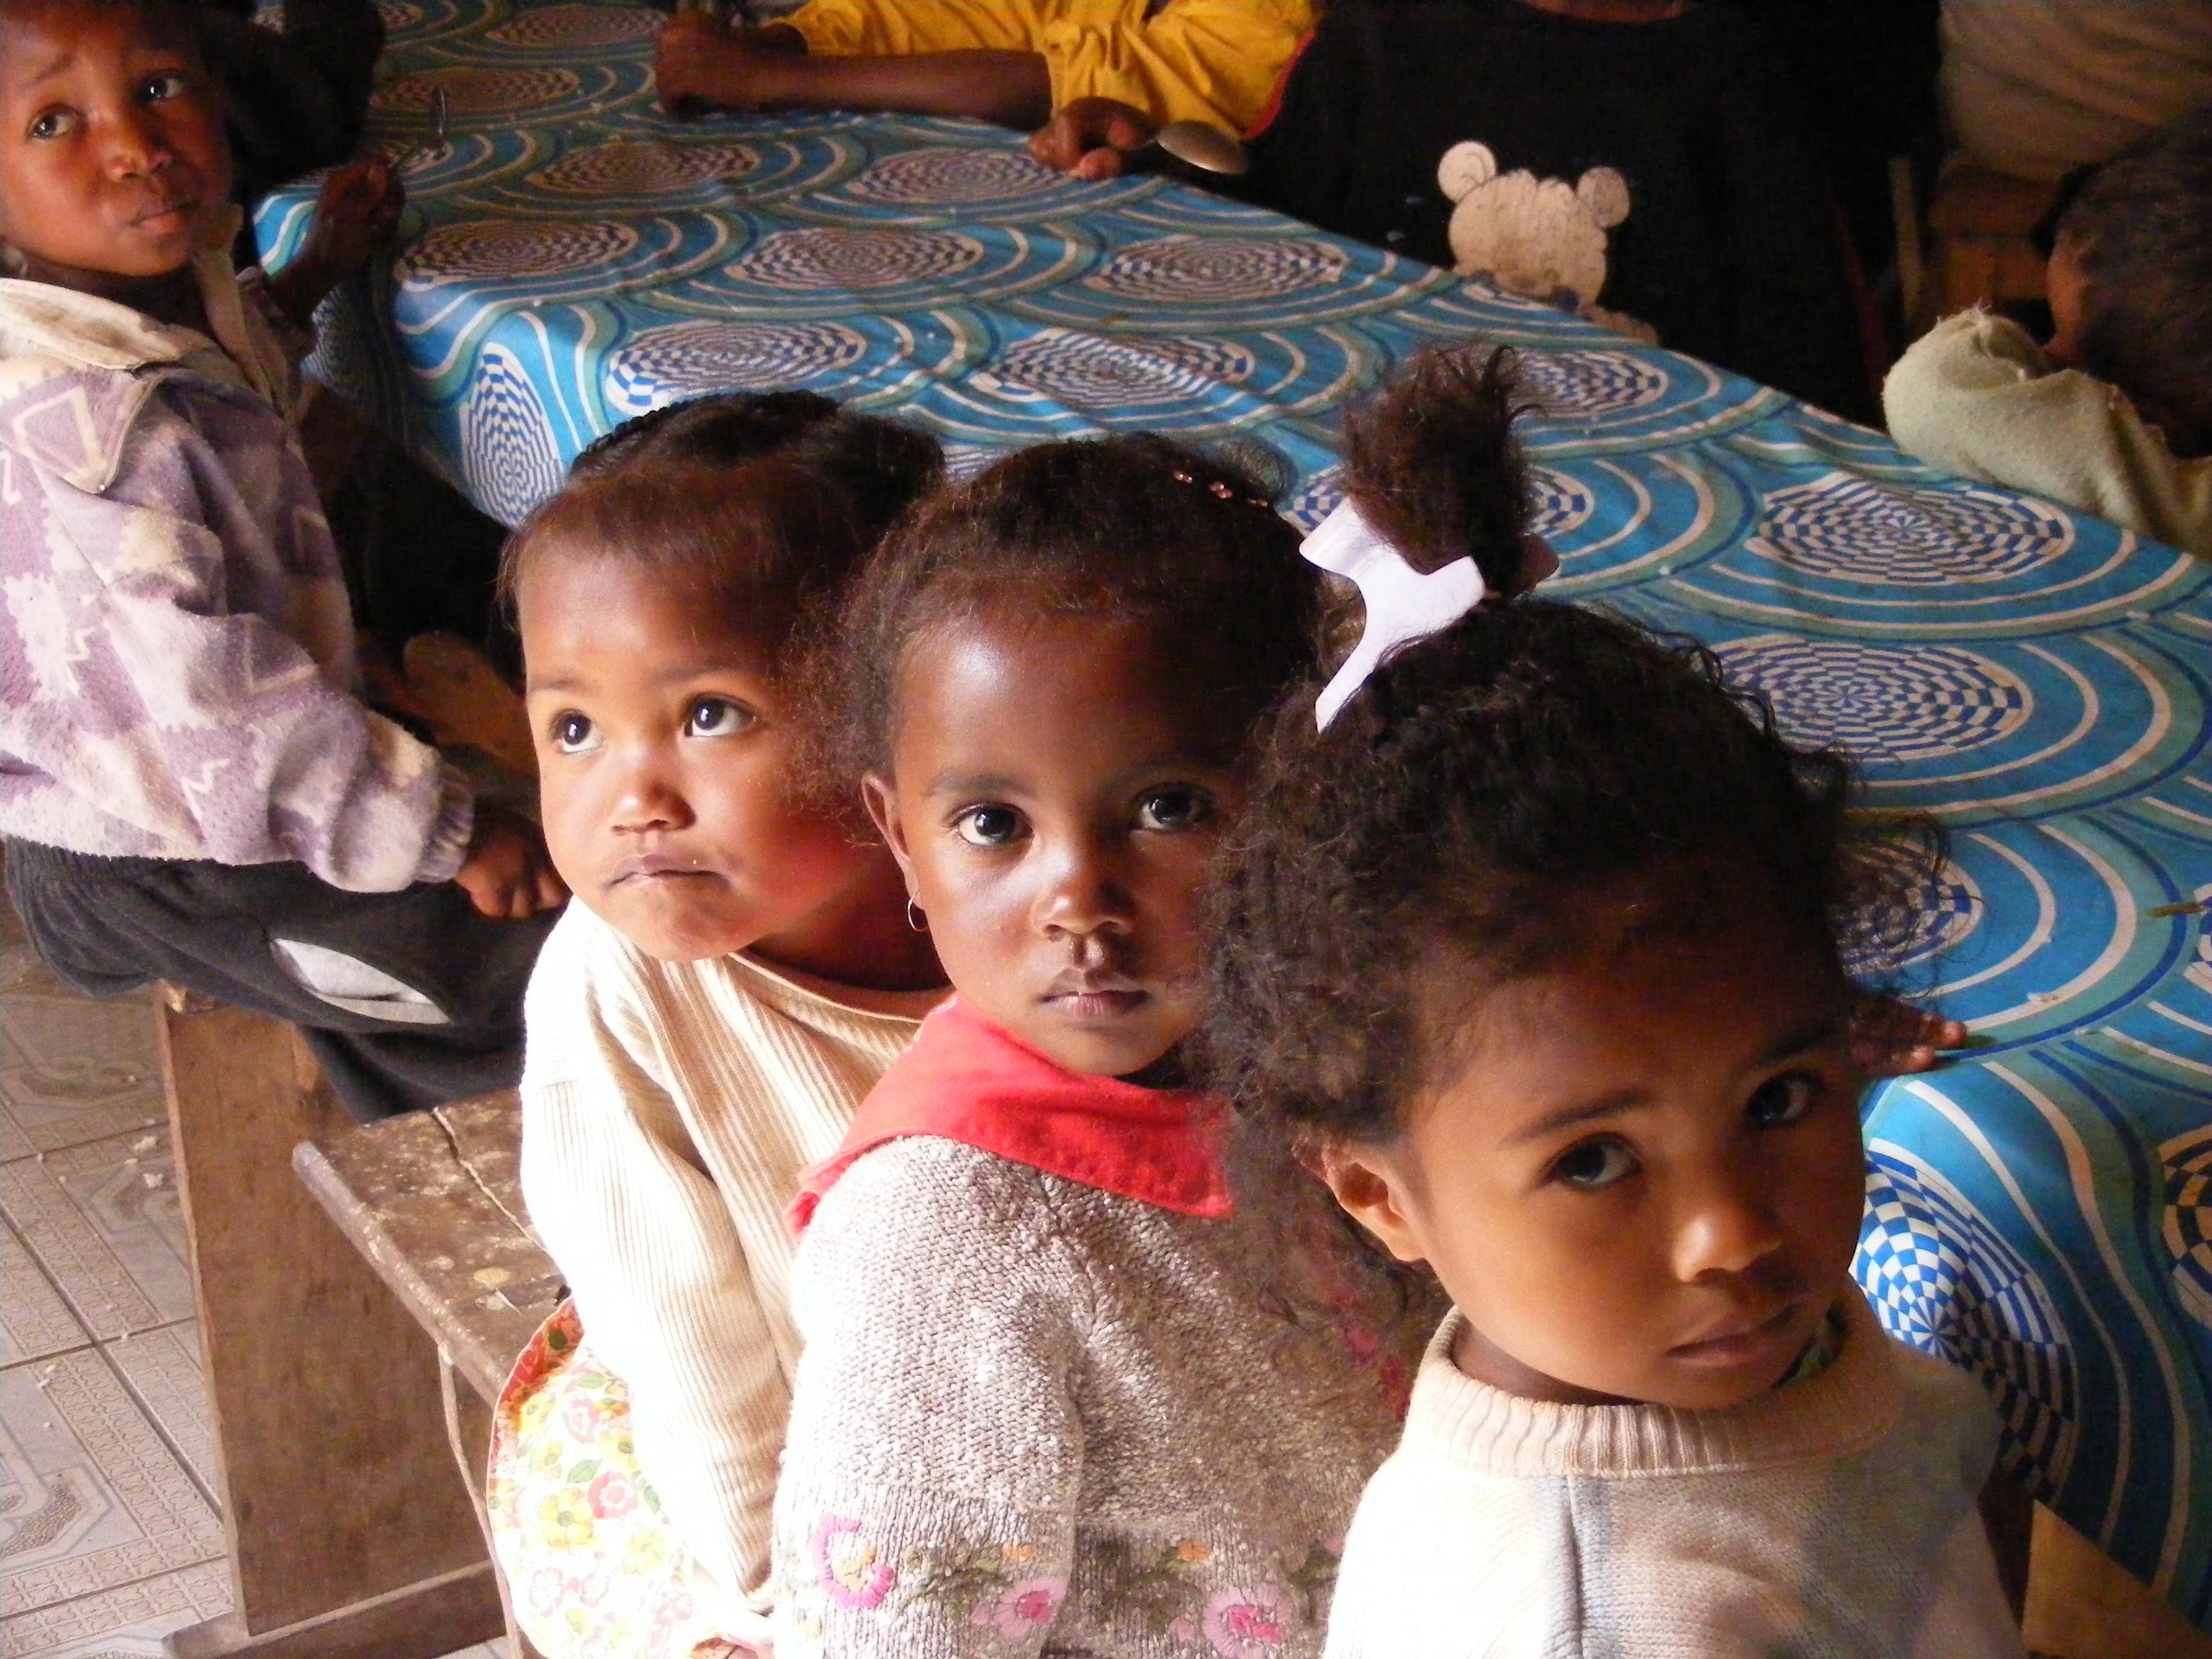 I bambini nella mensa di Manakara (Madagascar, 2008)